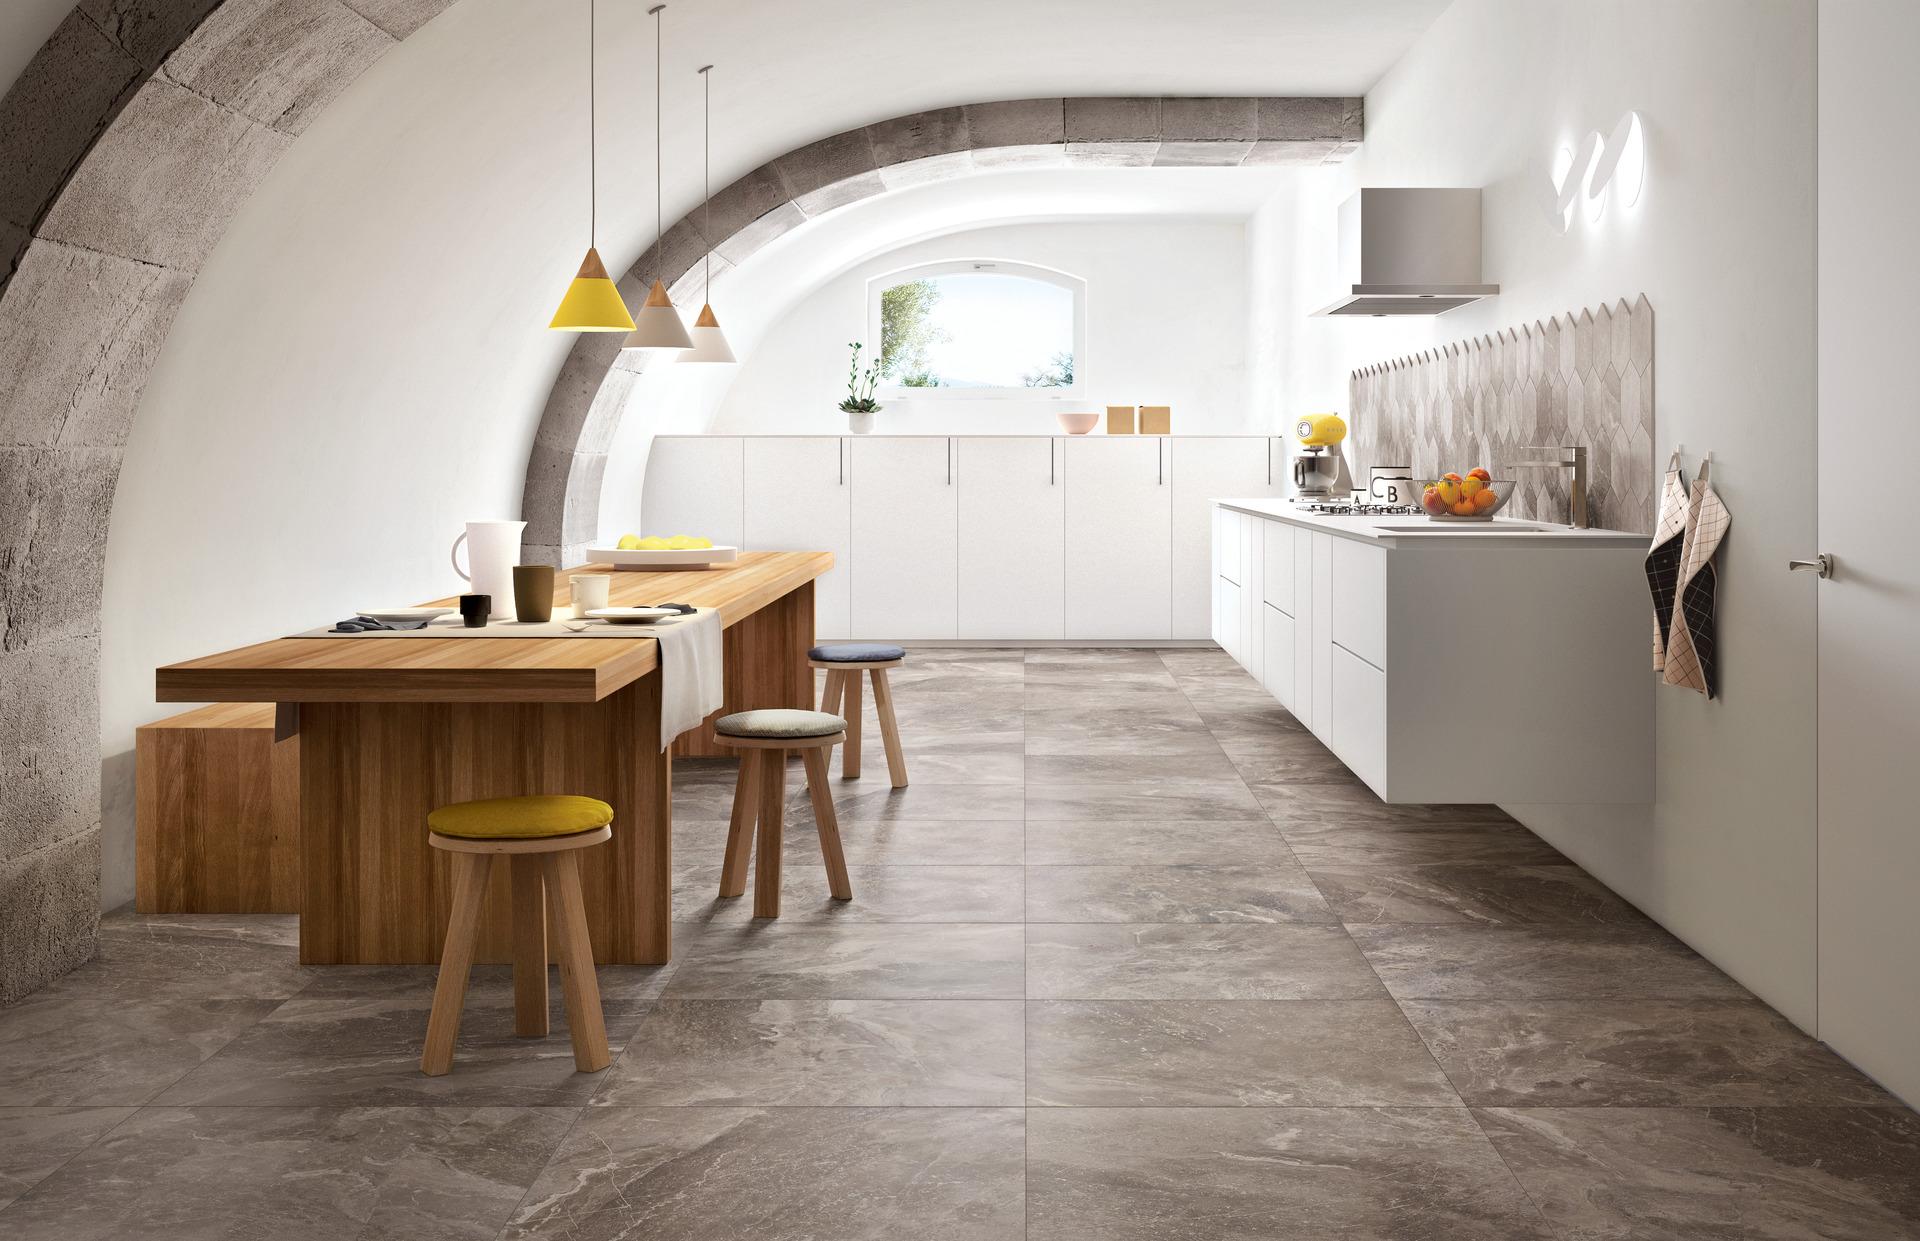 piastrelle cucina versatilit ed eleganza ragno. Black Bedroom Furniture Sets. Home Design Ideas